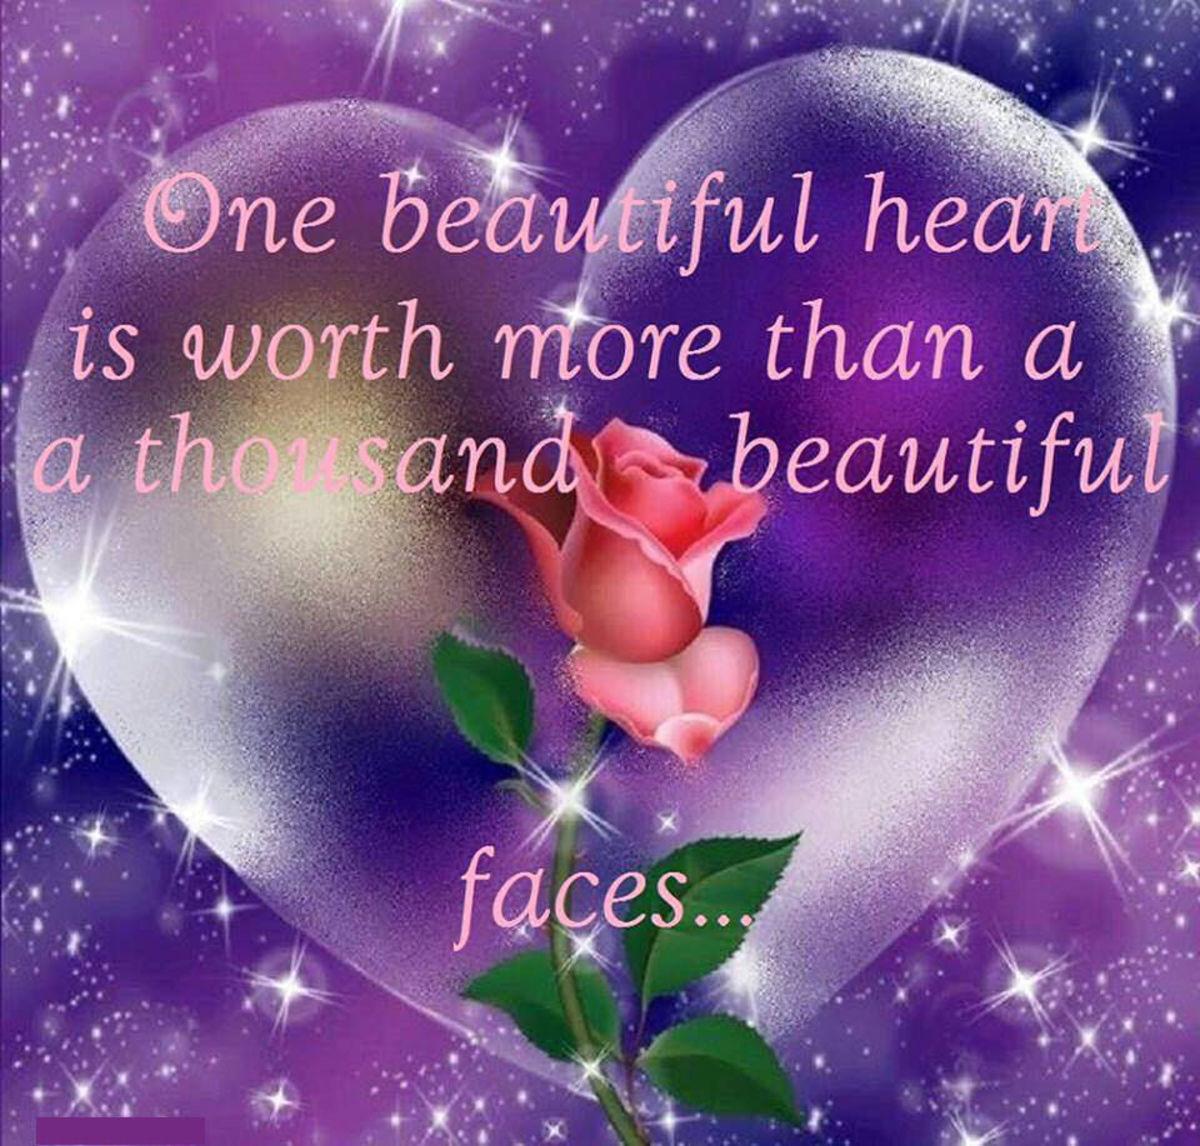 A  New Year's Heart of  Beauty. Monday's Inspiration 62. To a Special Friend Doris James Miz Bejabbers